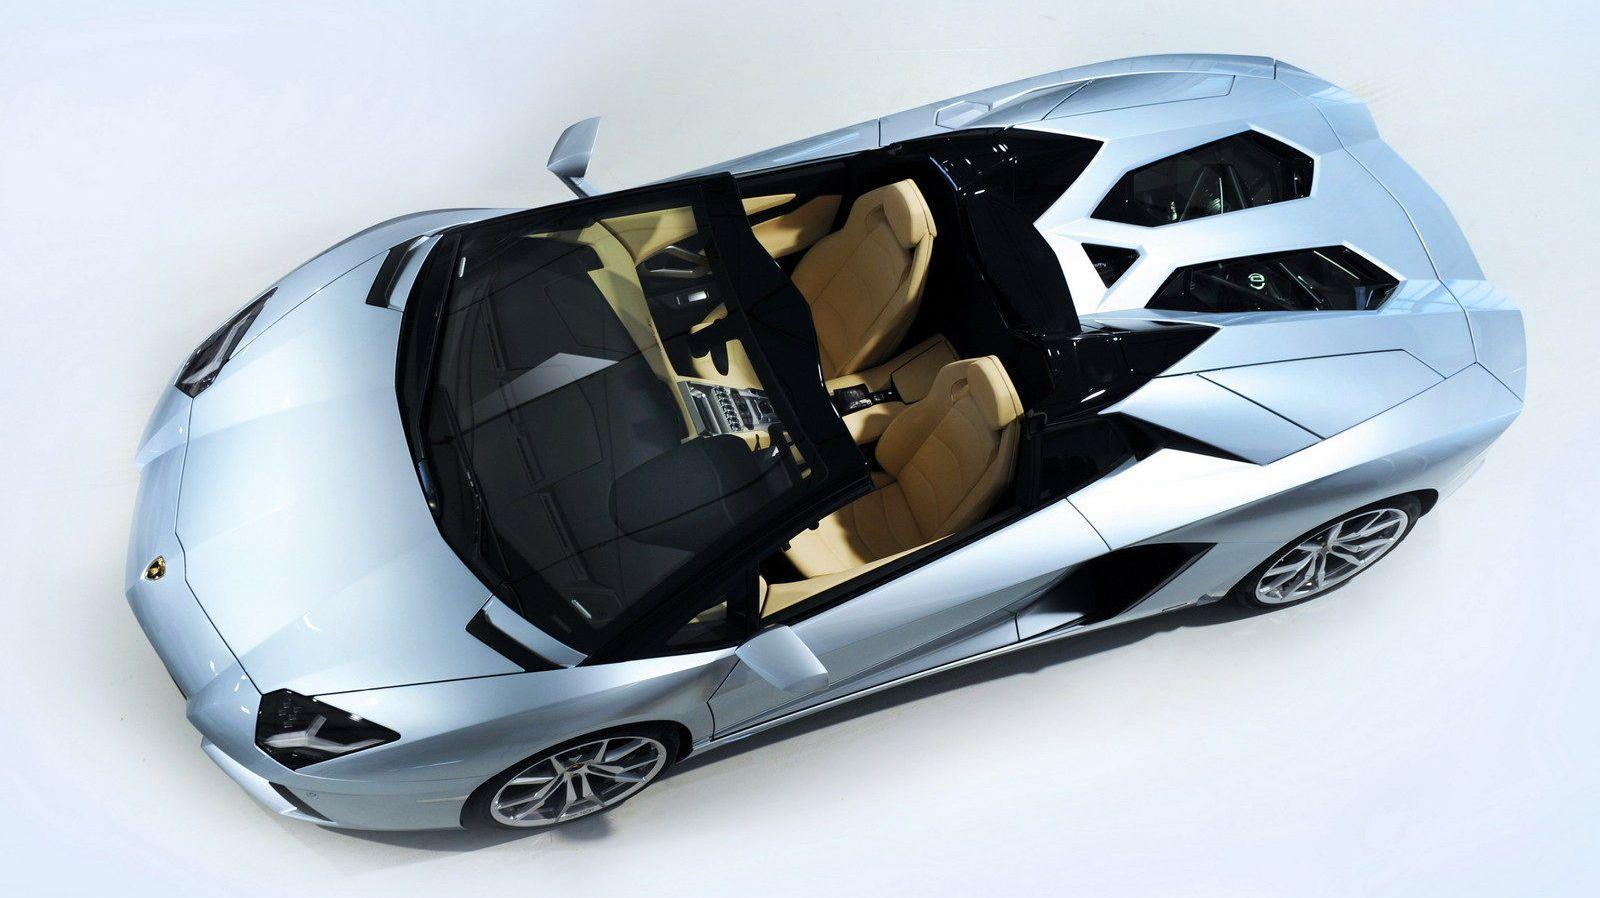 Toys For Boys Miami : Lamborghini aventador lebron experience by toys